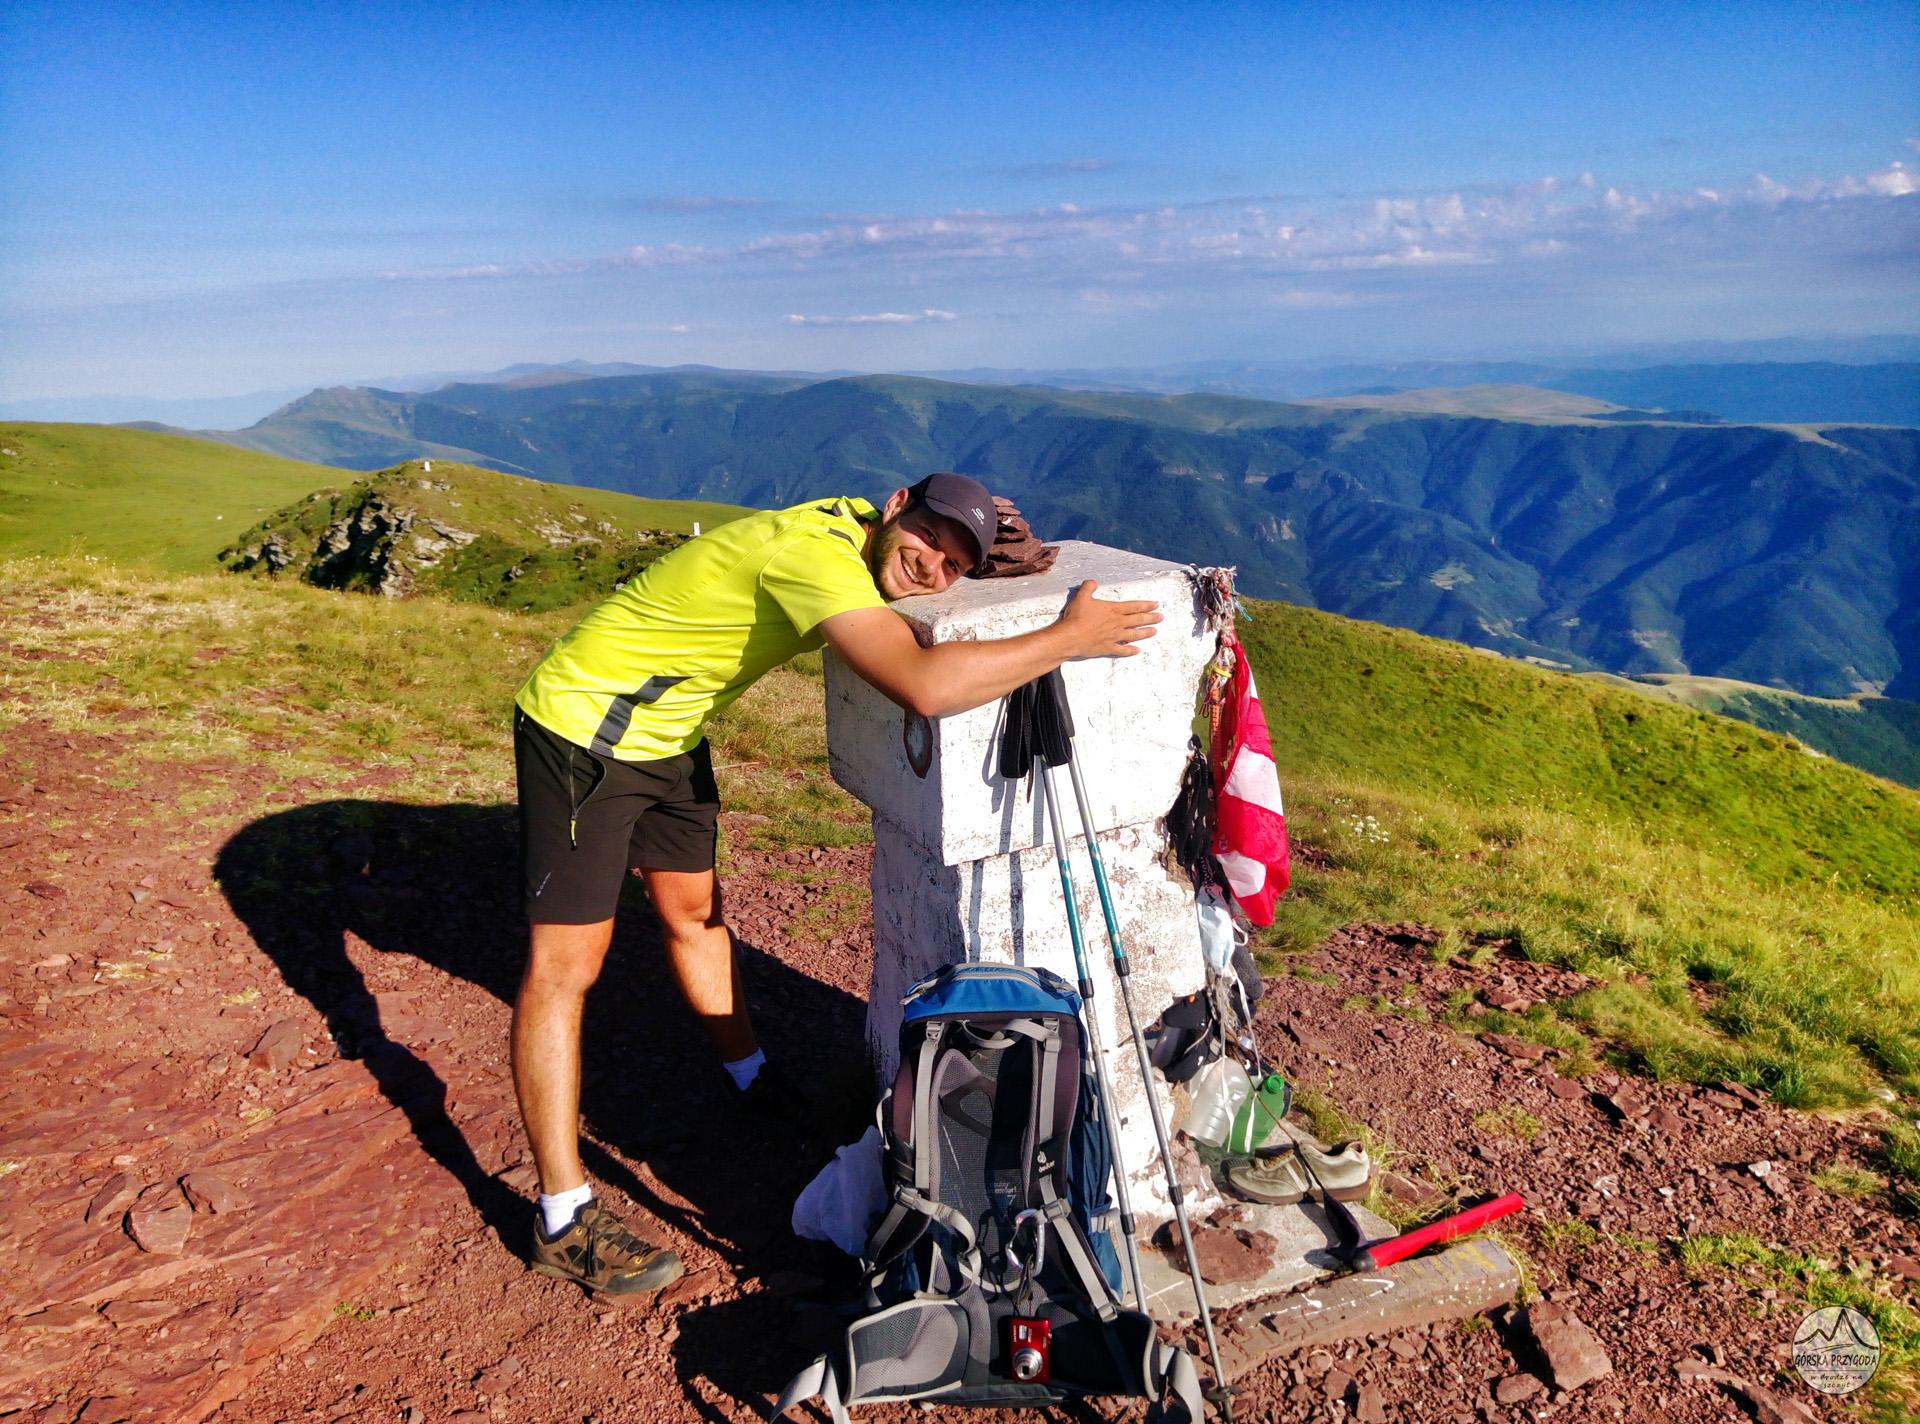 Midżur! Ostatni szczyt podczas Balkan Trip 2017